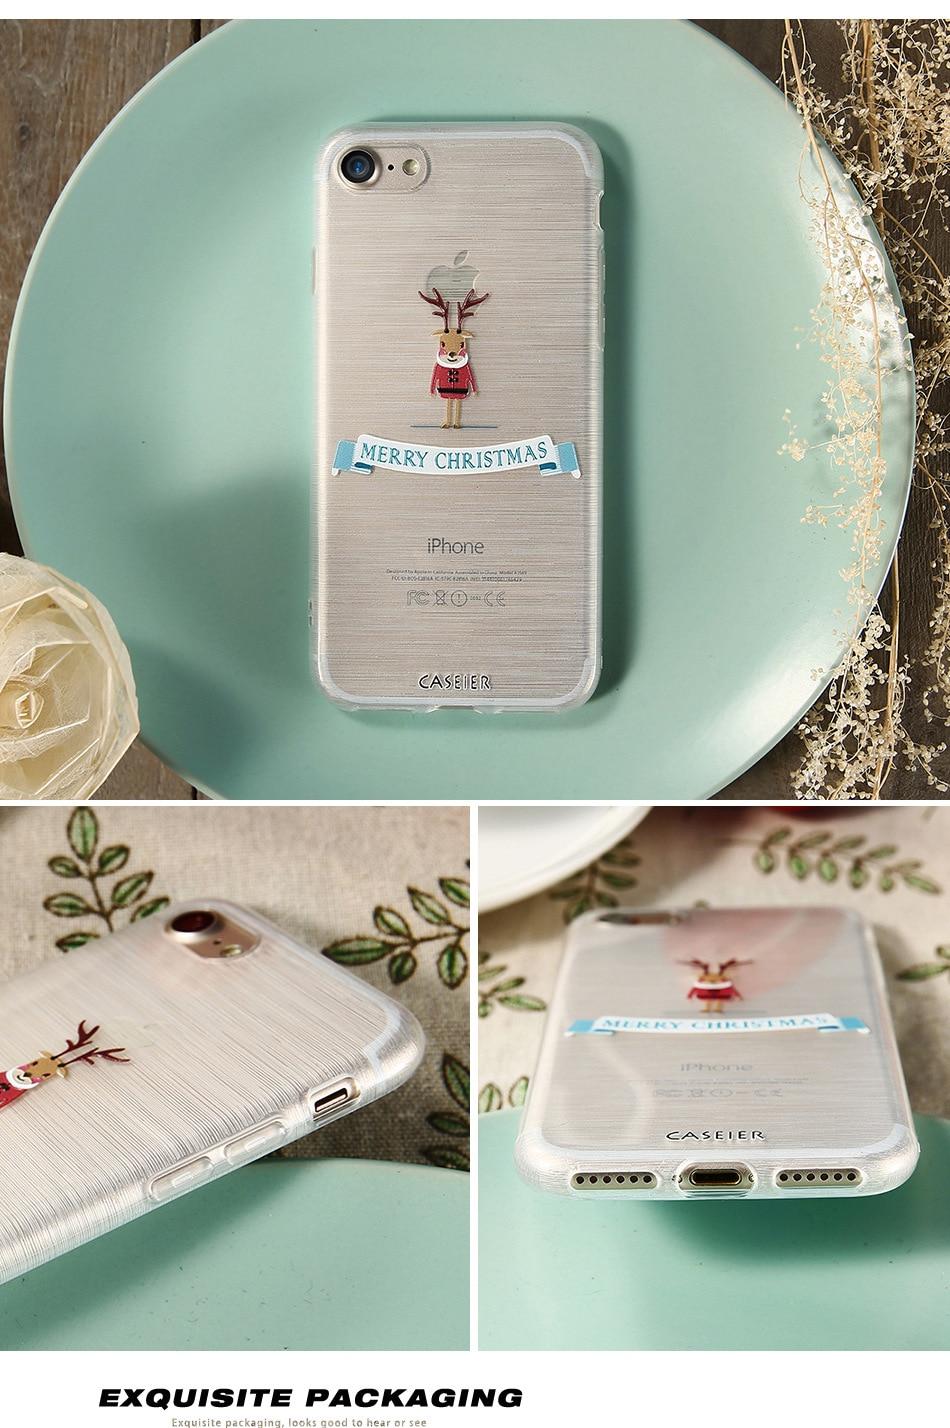 HTB1dnv1OpXXXXcoXXXXq6xXFXXXo - Christmas Phone Case For iPhone 7 6 6S Plus iPhone 5S SE 5 Cases For Samsung Galaxy S6 S7 Edge Cute Cover Accessories PTC 286